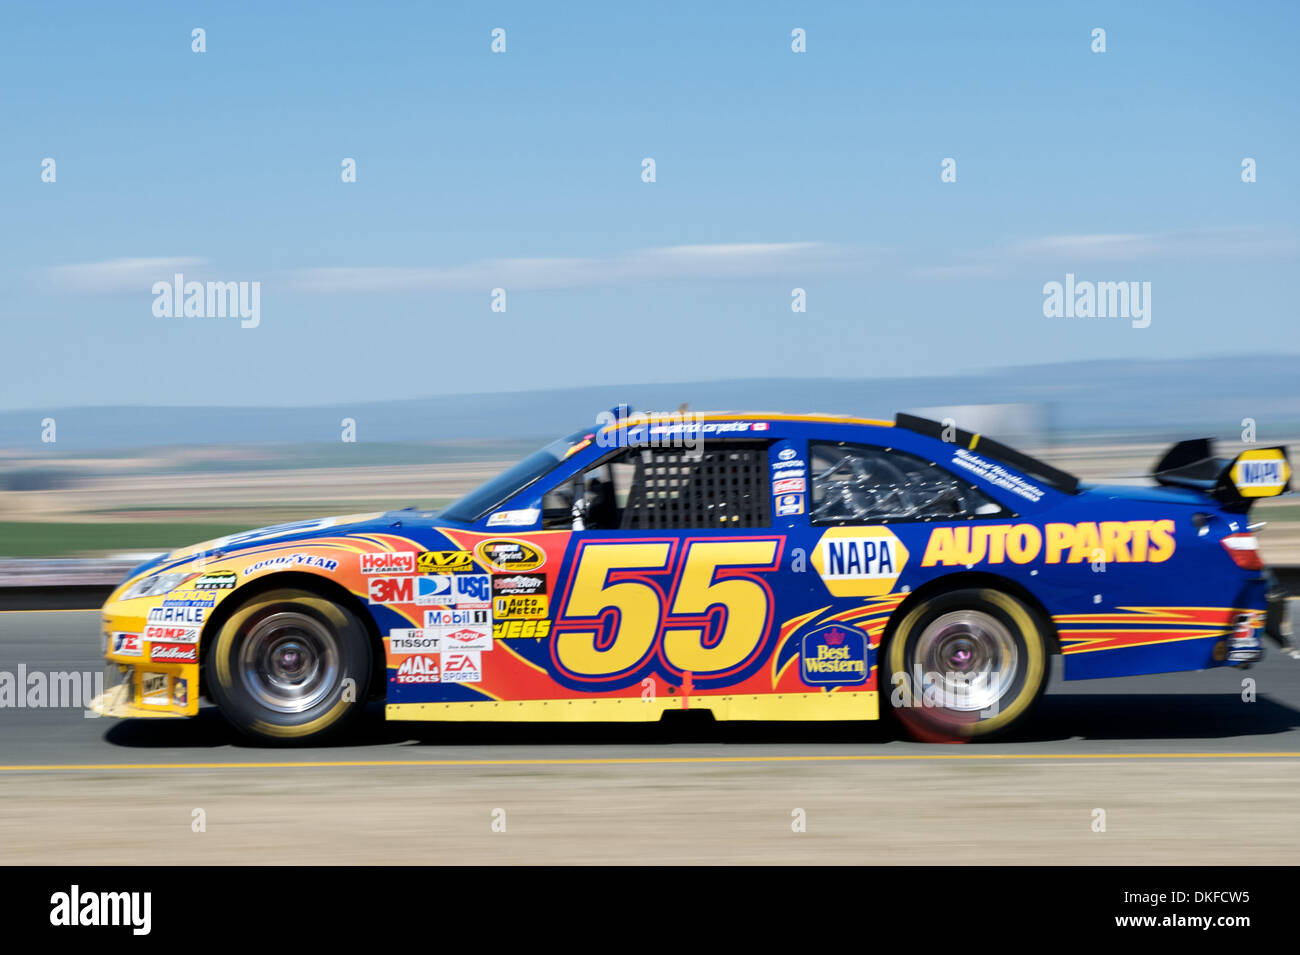 a21ae61f1df Michael Waltrip Racing Stock Photos   Michael Waltrip Racing Stock ...